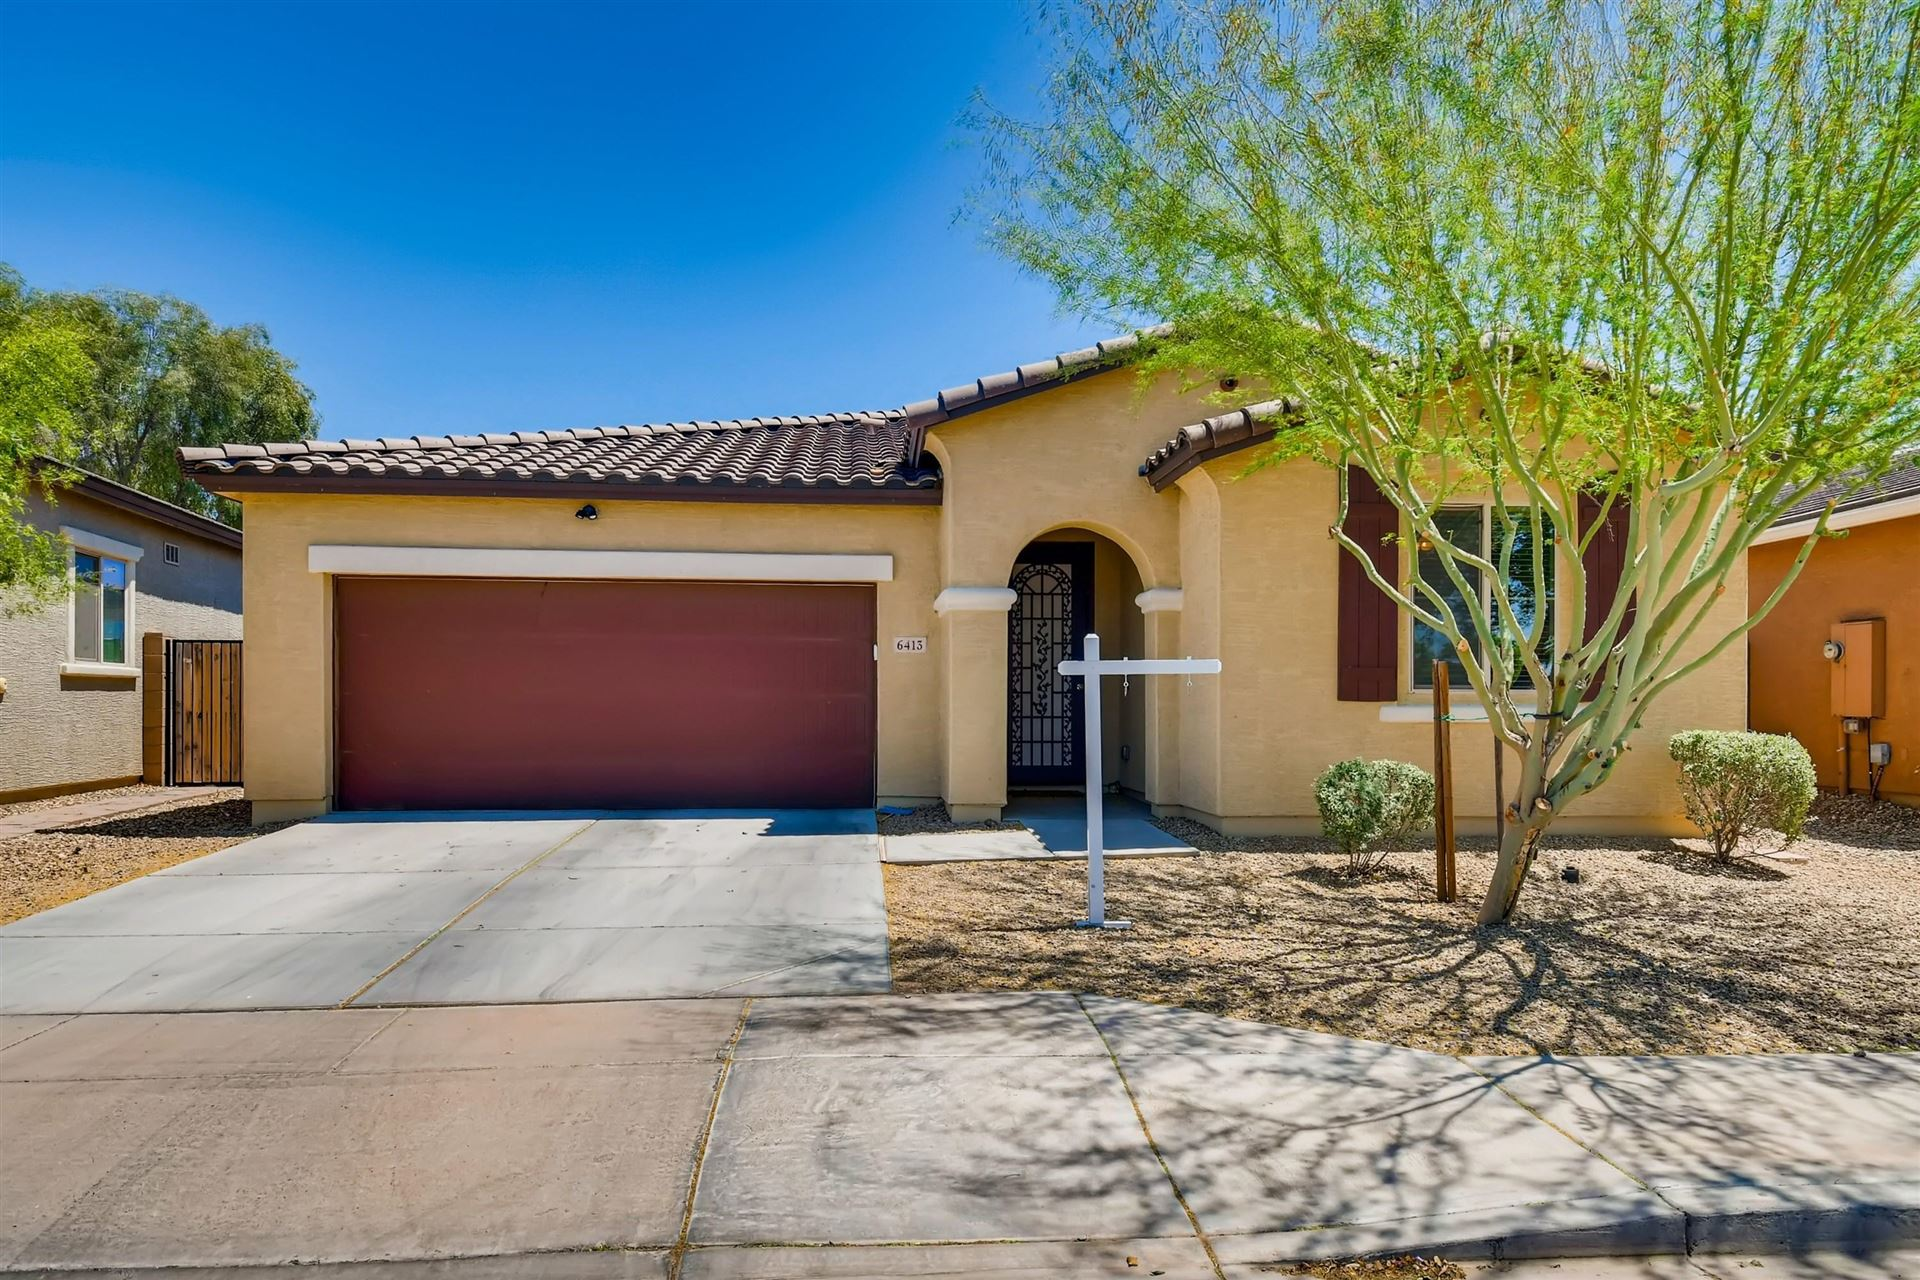 Photo of 6413 S 47TH Drive, Laveen, AZ 85339 (MLS # 6230290)